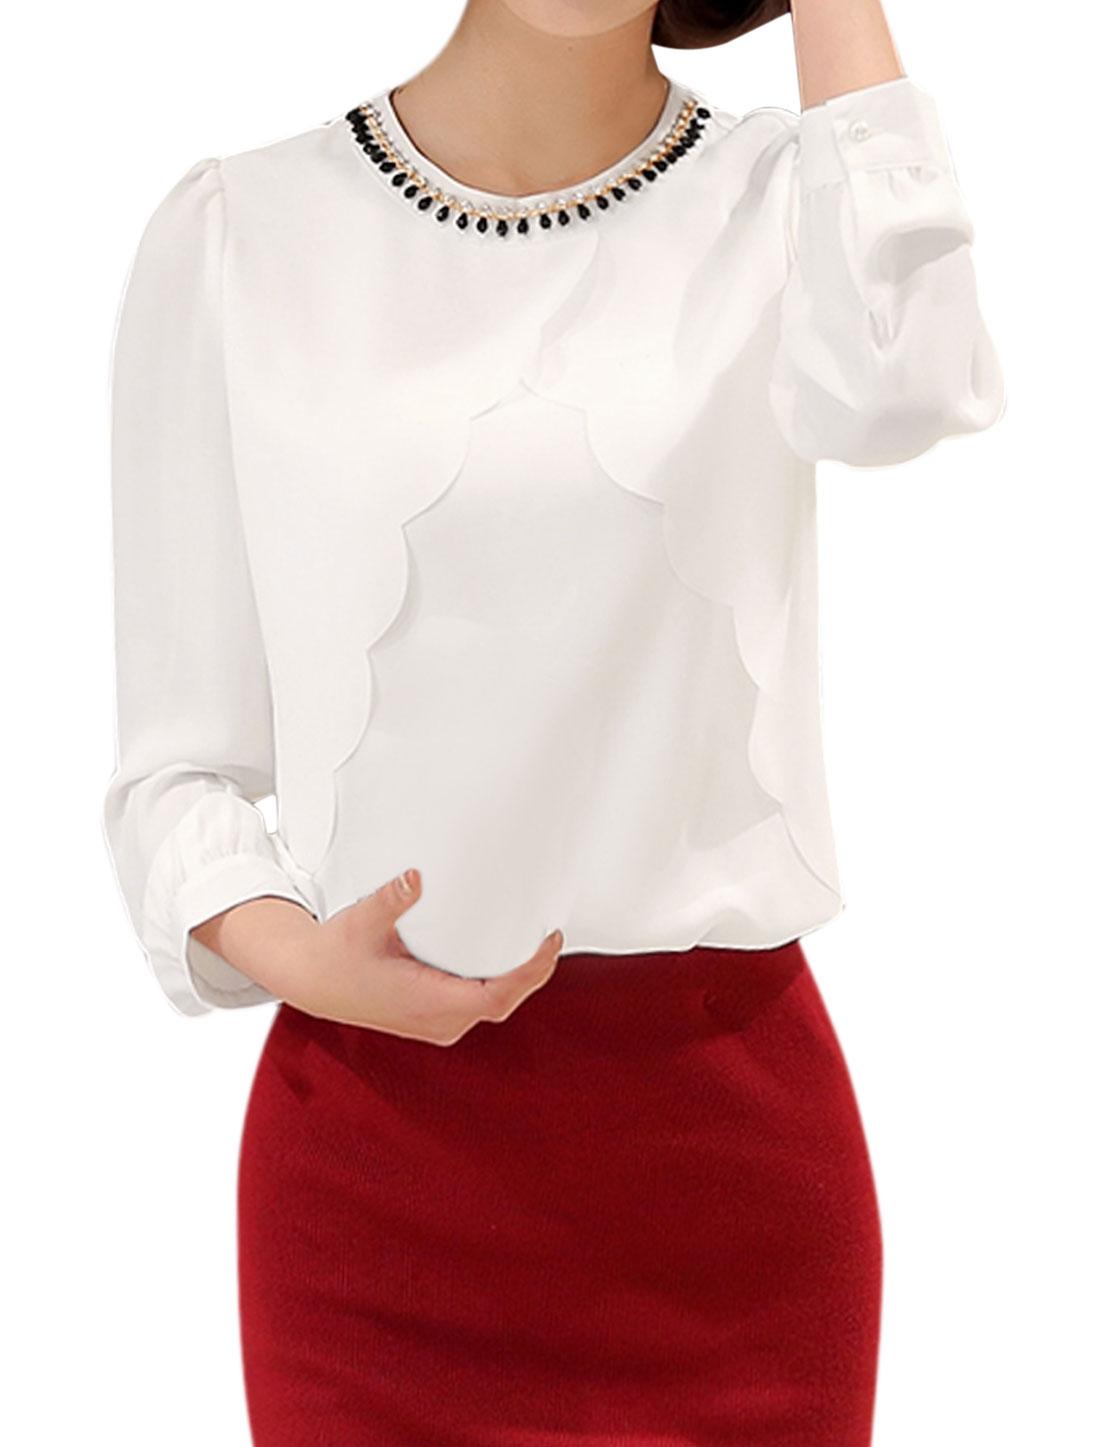 Women Rhinestones Decor Scalloped Overlay Front Blouse White M